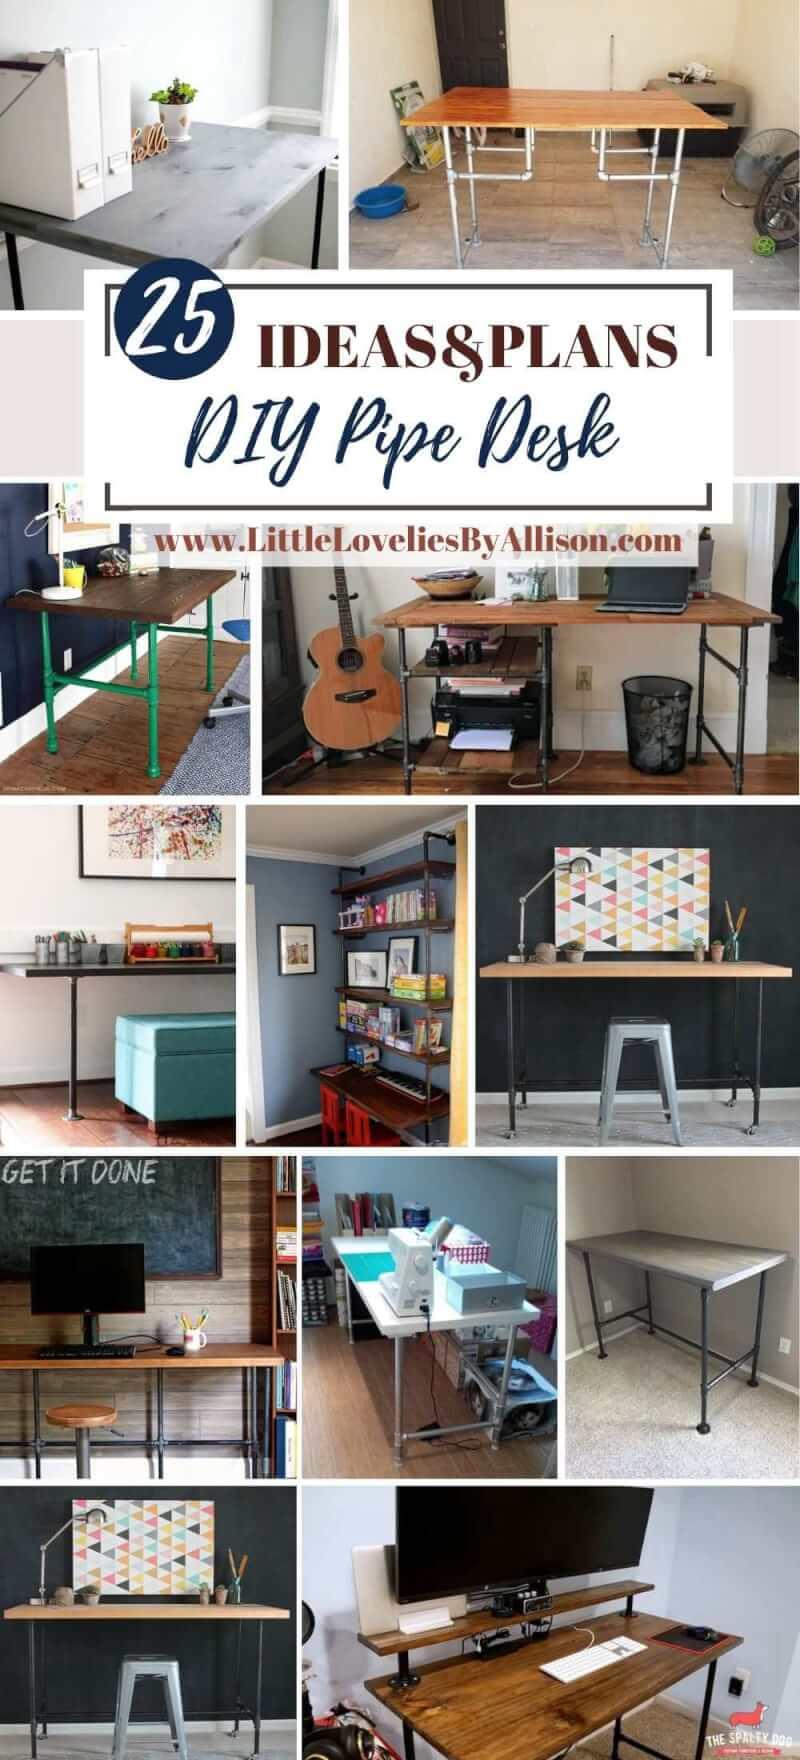 25 DIY Pipe Desk Ideas_ How To Build A Pipe Desk